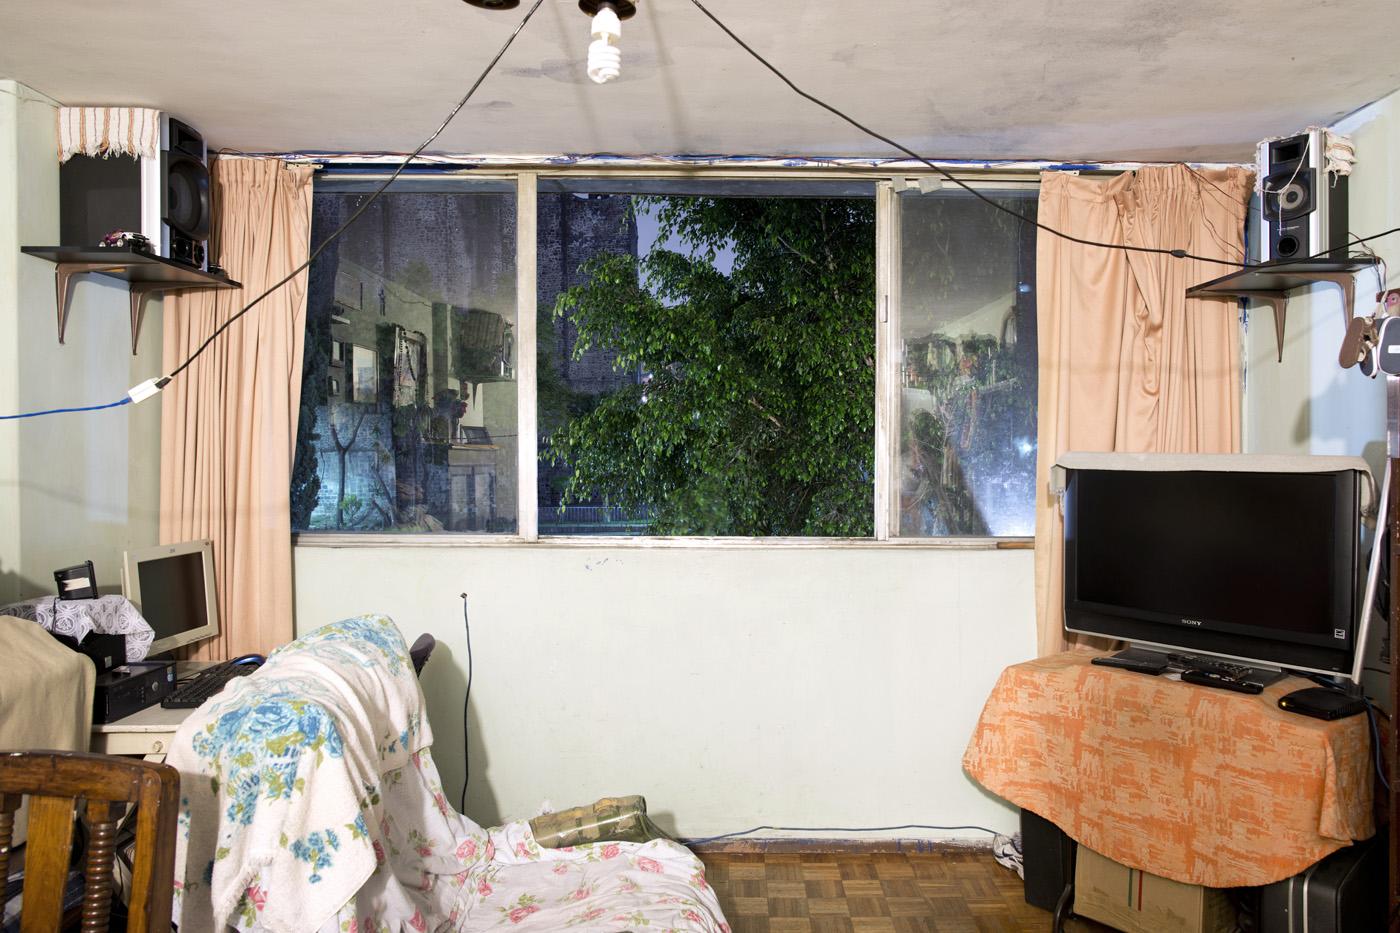 C-109, María del Rocío Pérez Turlay. The interior livingroom windows of apartments in the Chihuahua building of Tlatelolco. Mario Pani´s Tlatelolco, plaza de las 3 culturas, Mexico DF